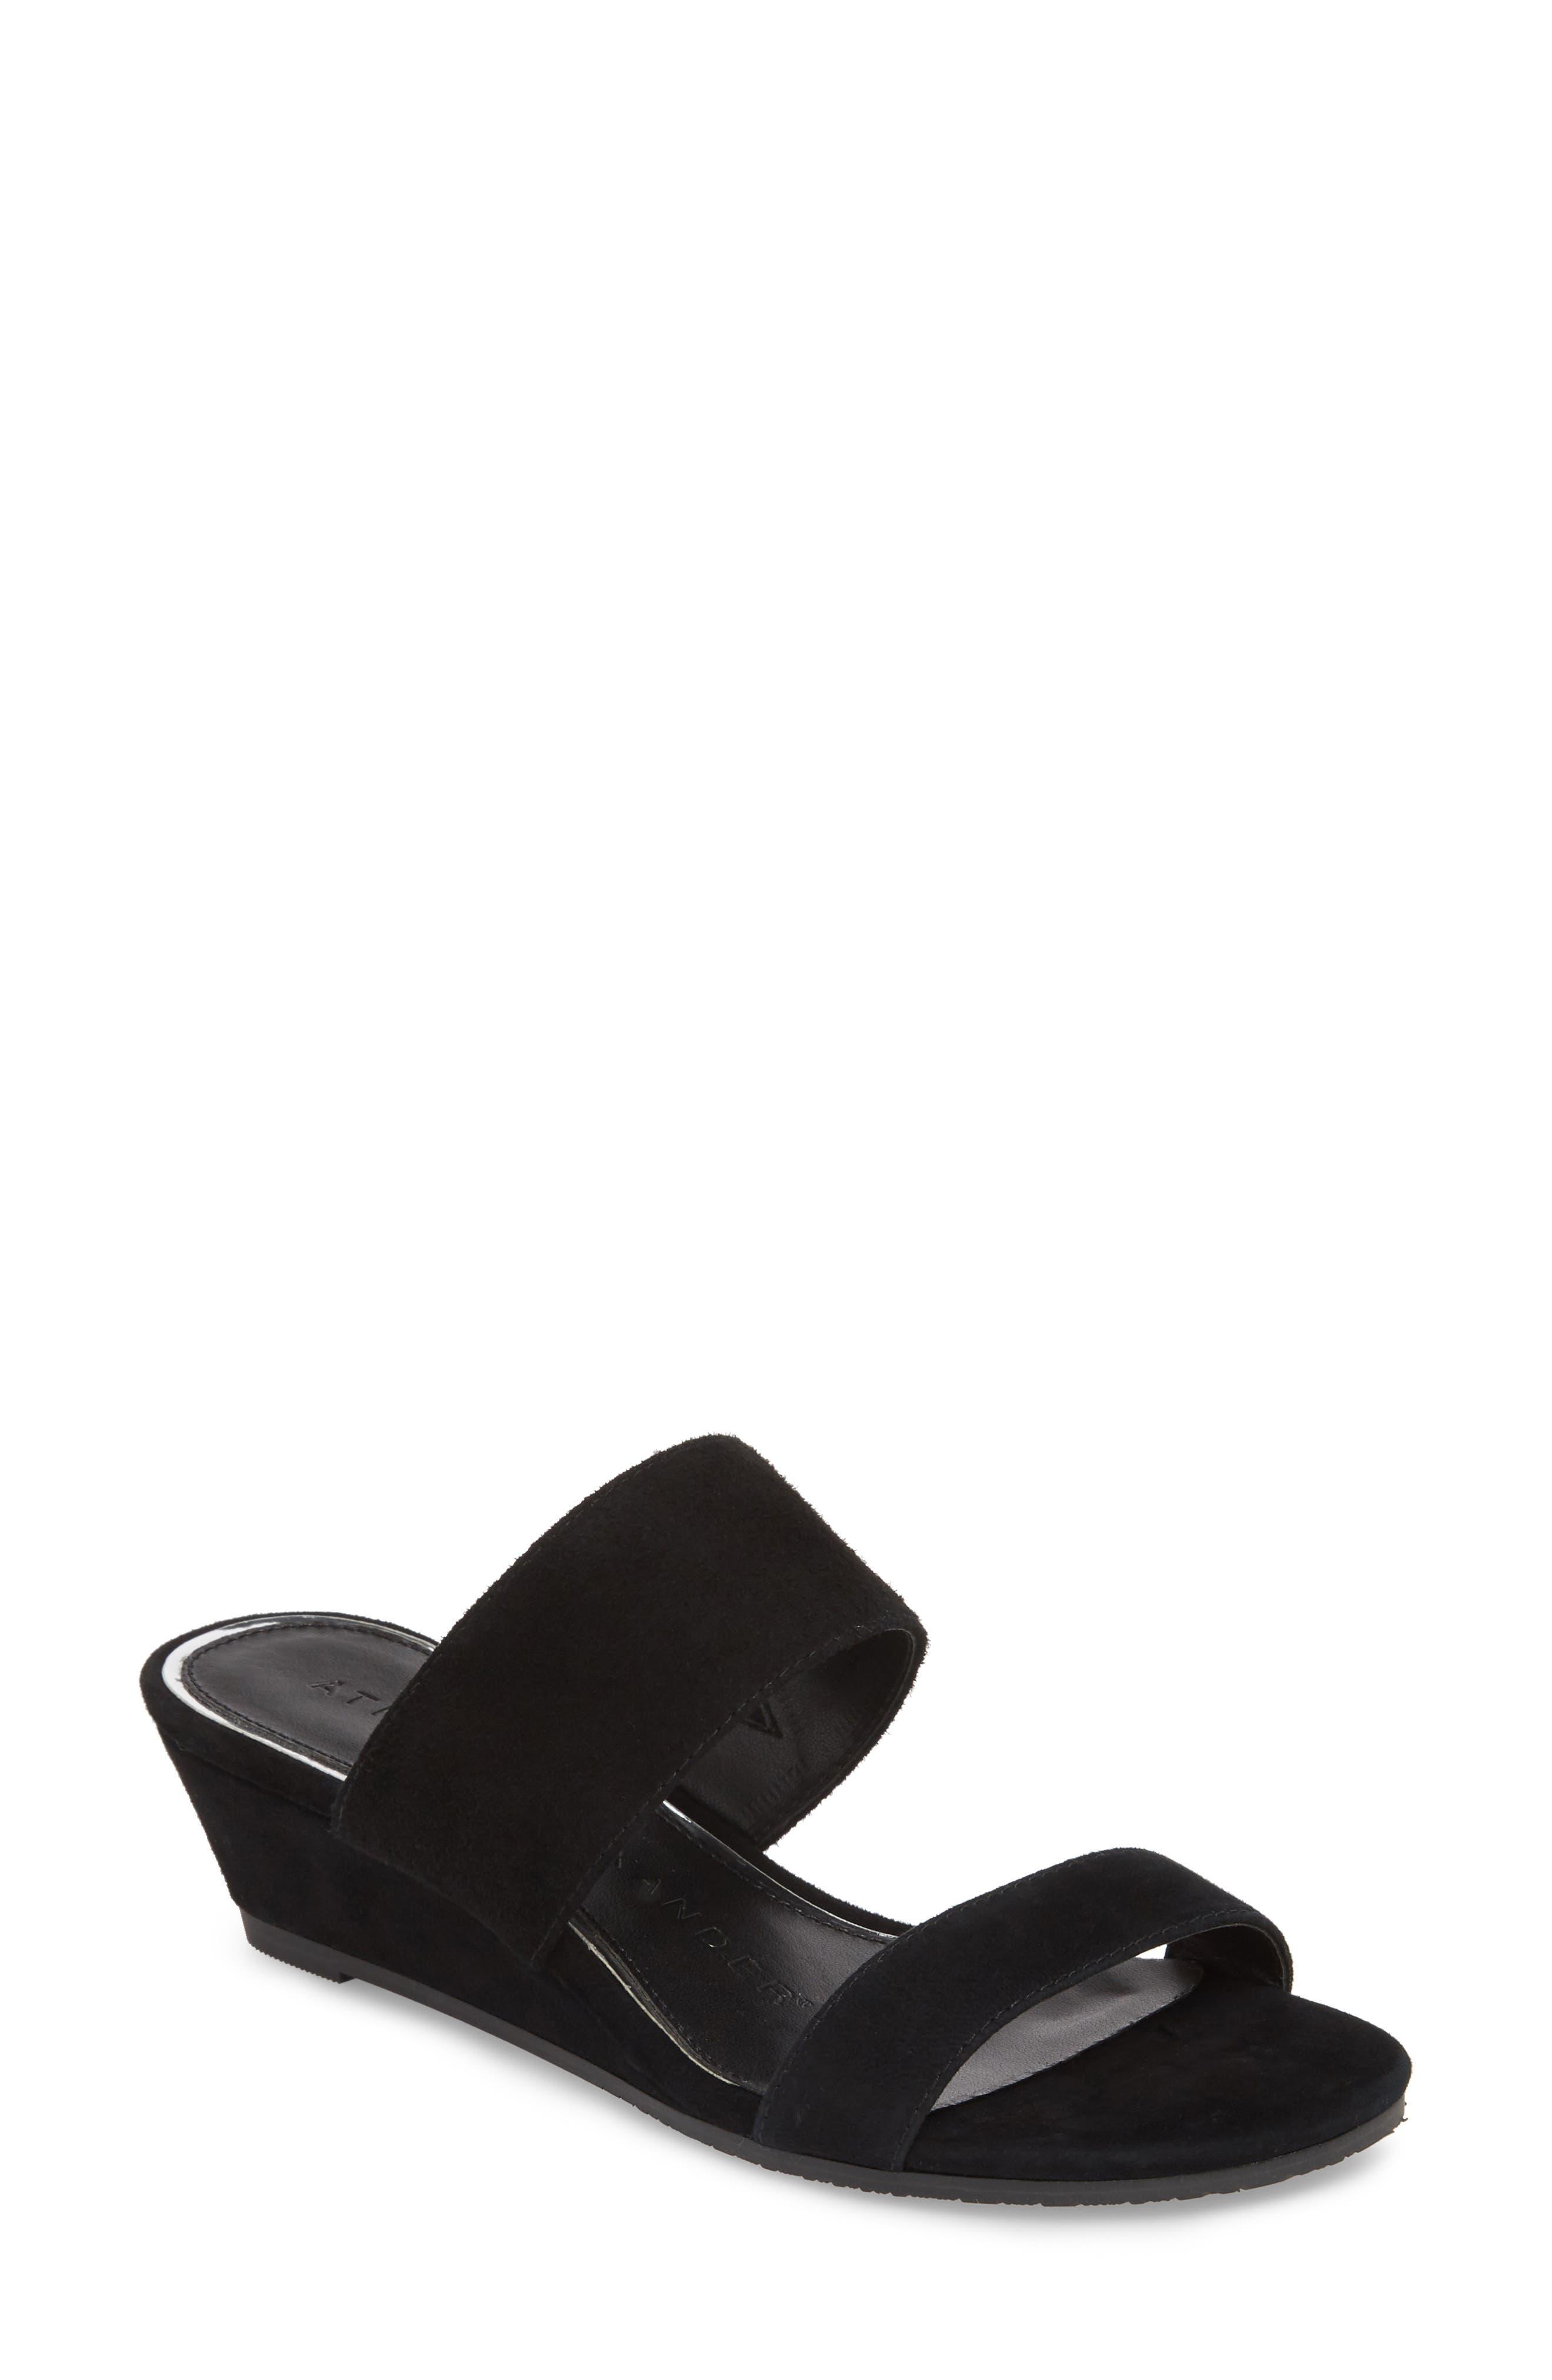 Athena Alexander Burlington Wedge Slide Sandal (Women)